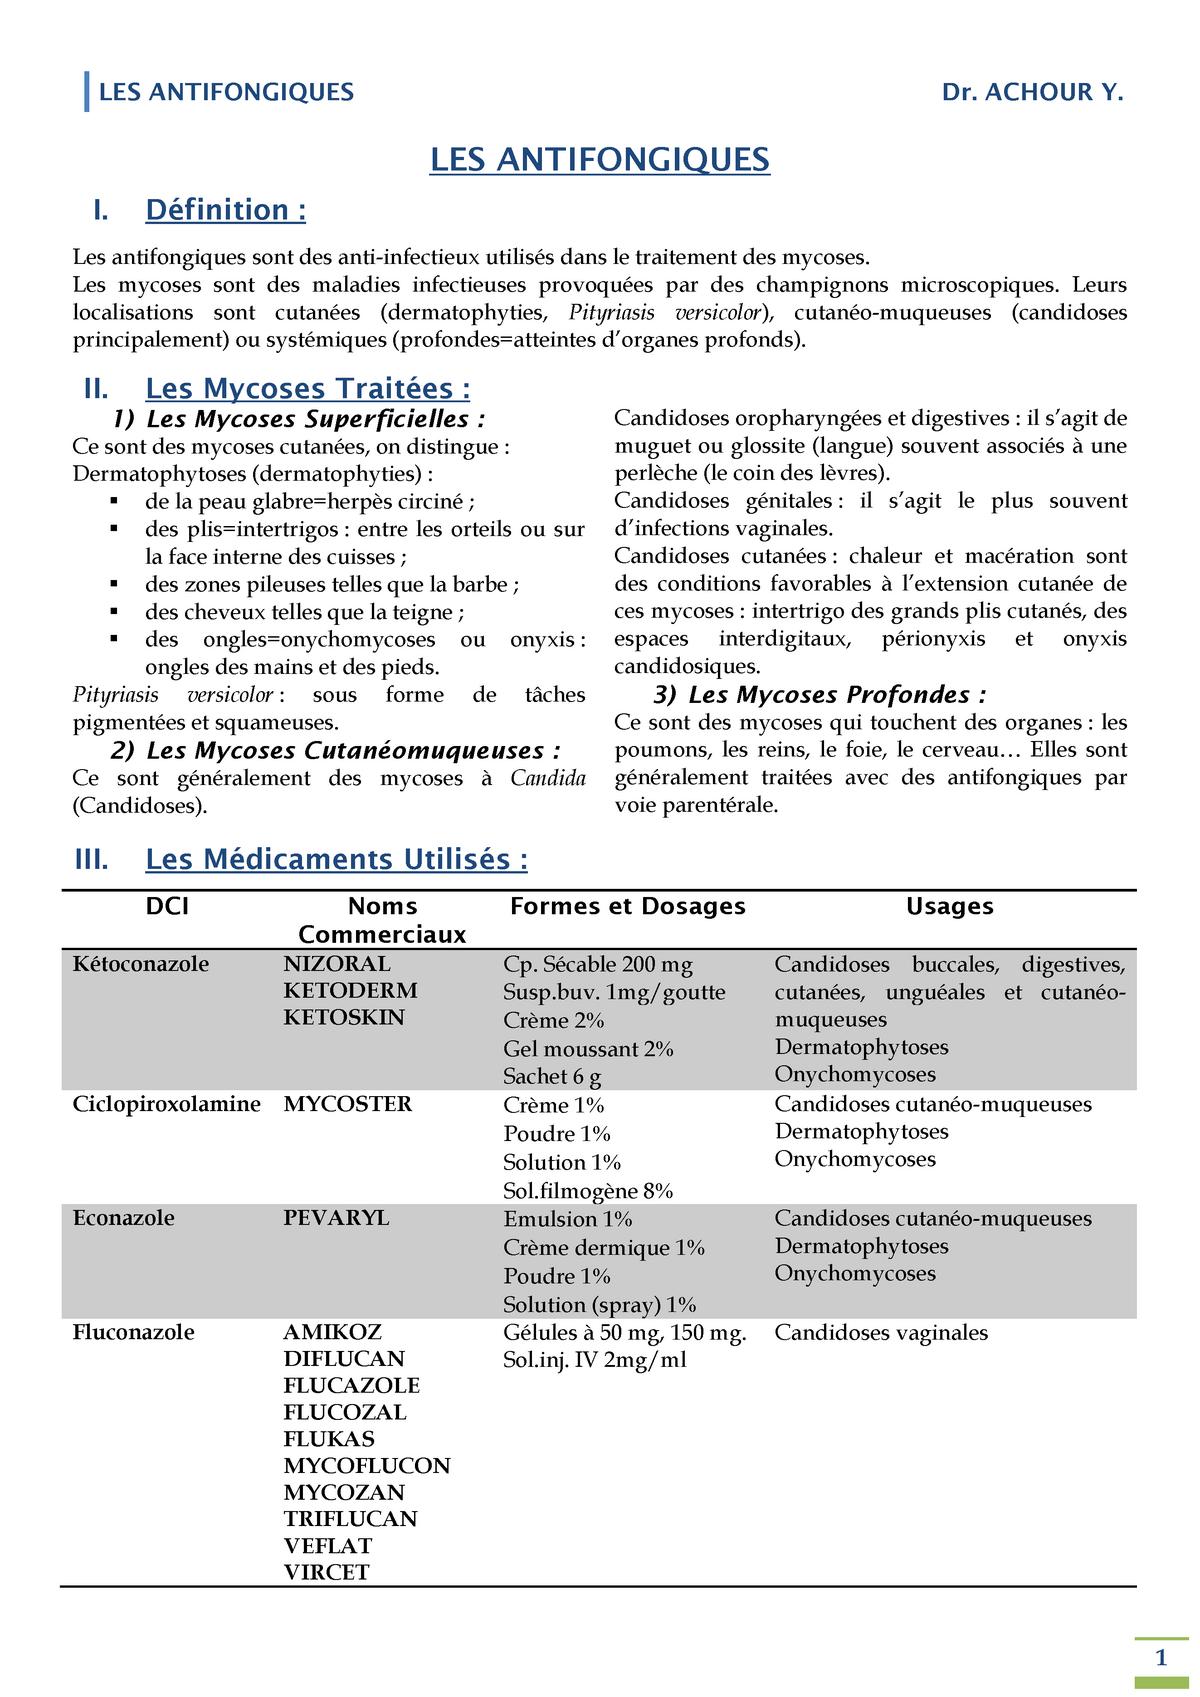 Les Antifongiques - Pharmacologie Pharmaco - StuDocu